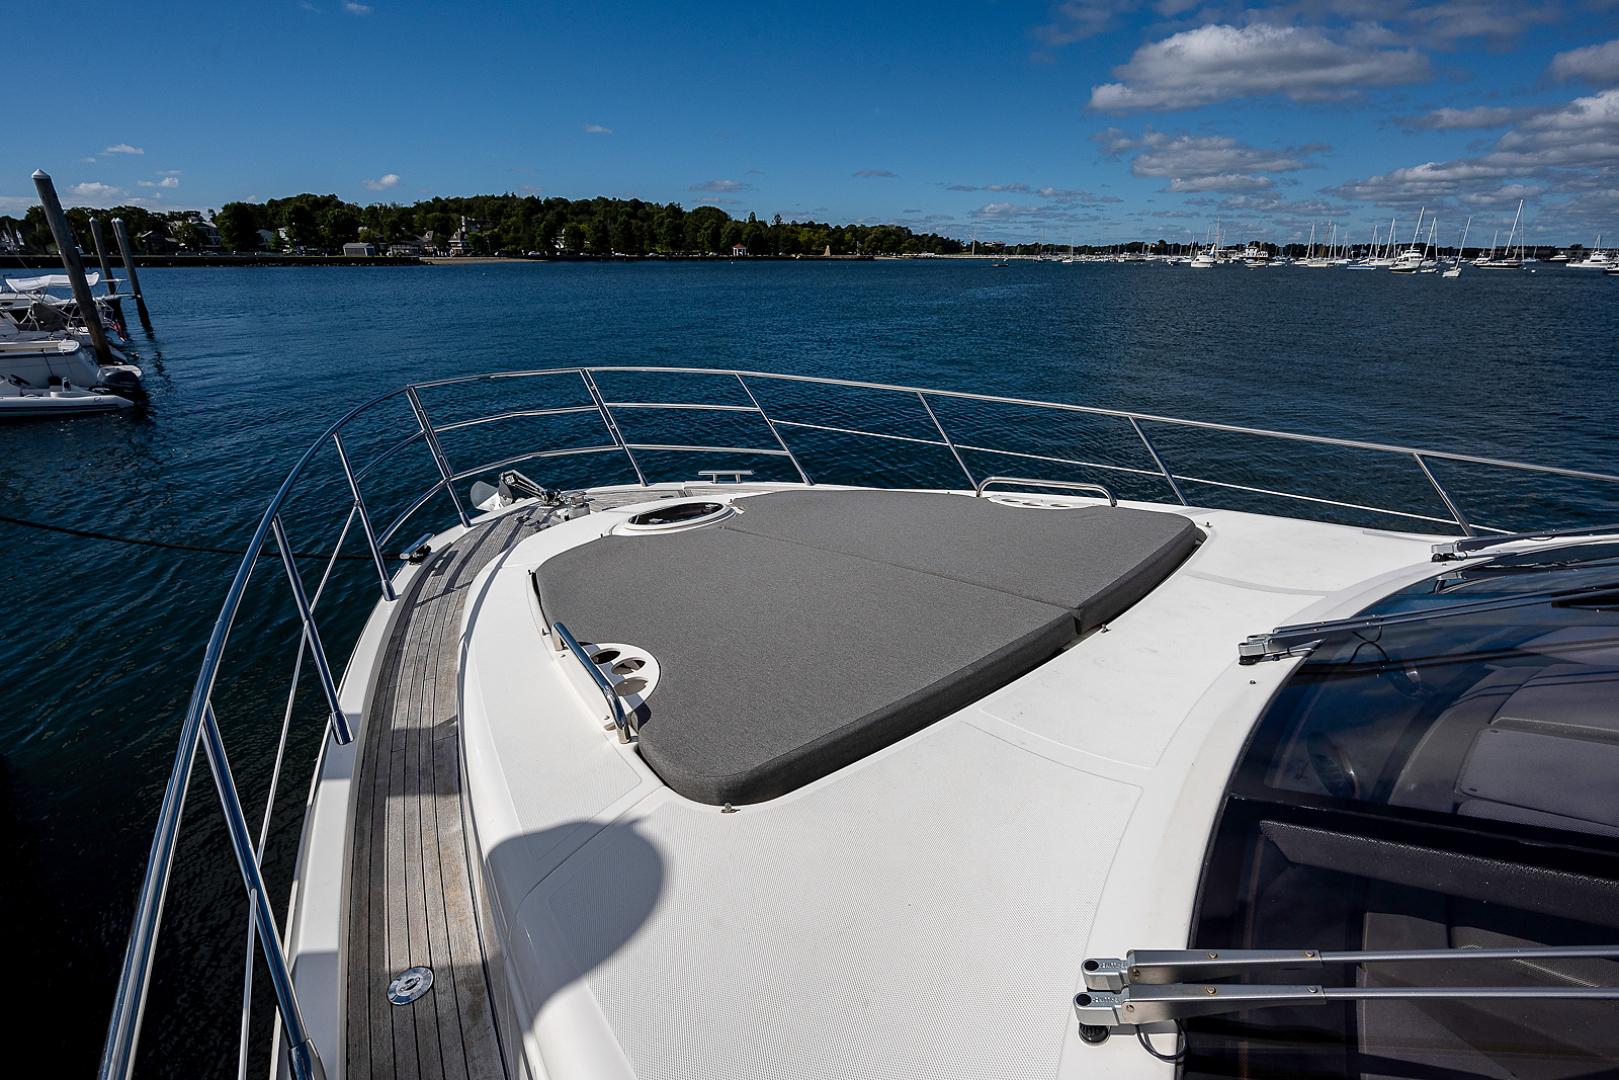 Azimut-58 Fly Motor Yacht 2011-Nova Fort Lauderdale-Florida-United States-58_azimut_nova__bow11-1490488 | Thumbnail